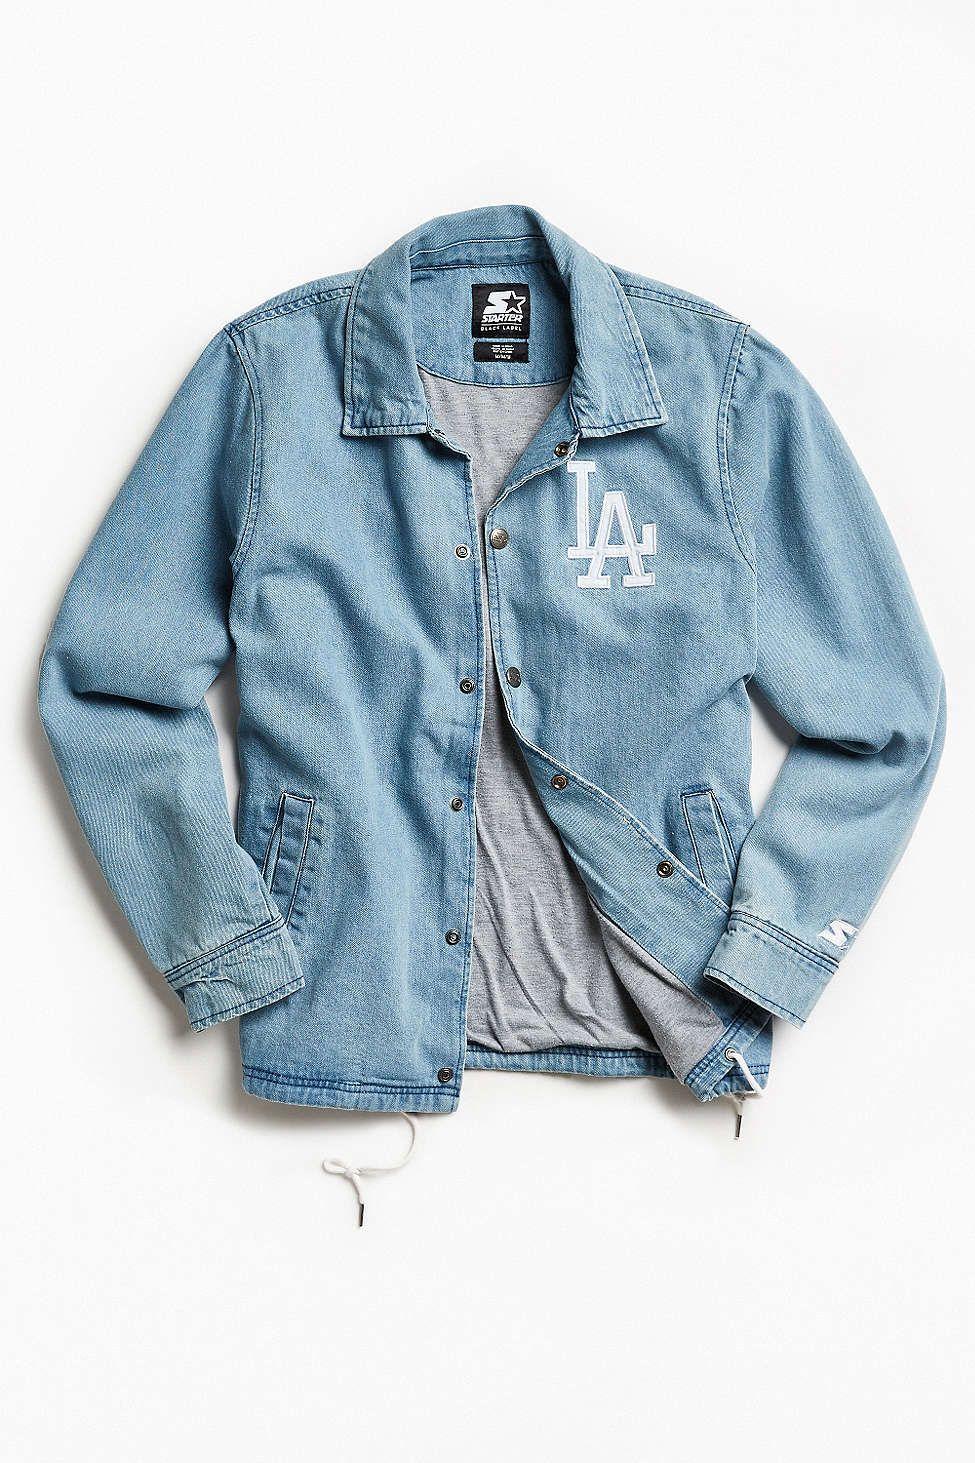 Starter Black Label Uo Los Angeles Denim Coach Jacket Denim Jacket Women Stylish Jackets Denim Jacket Men [ 1463 x 975 Pixel ]